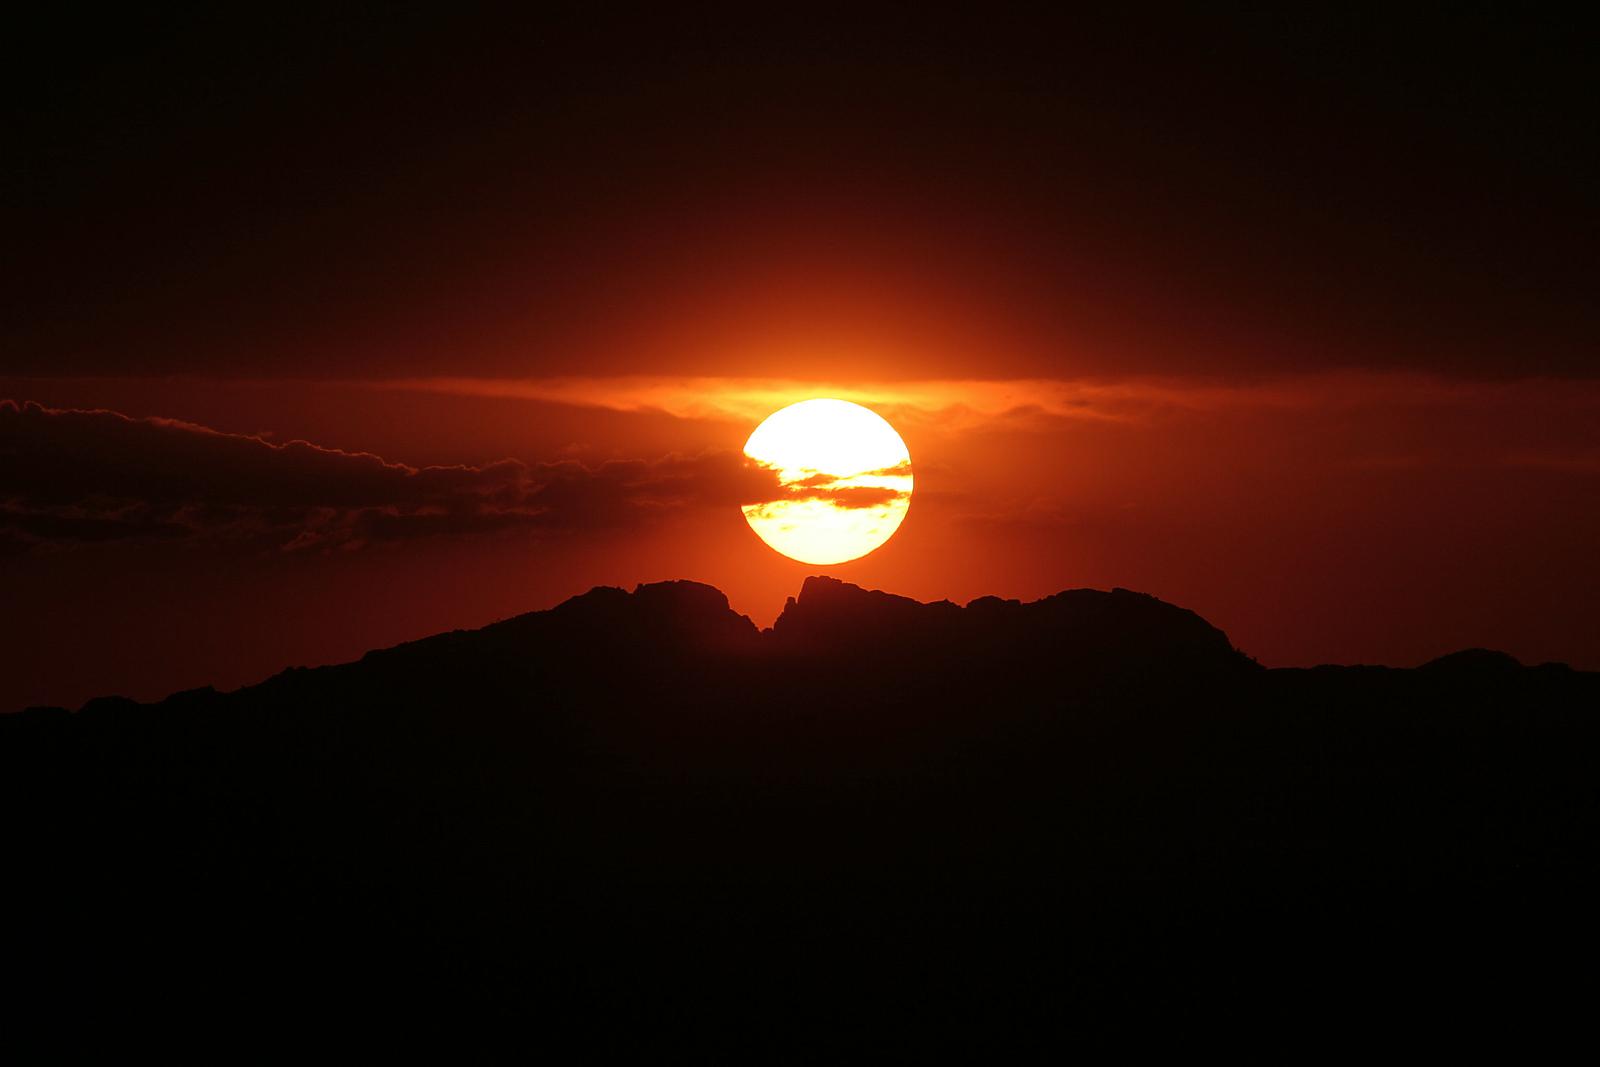 Sunset over Split Rock - Wyoming